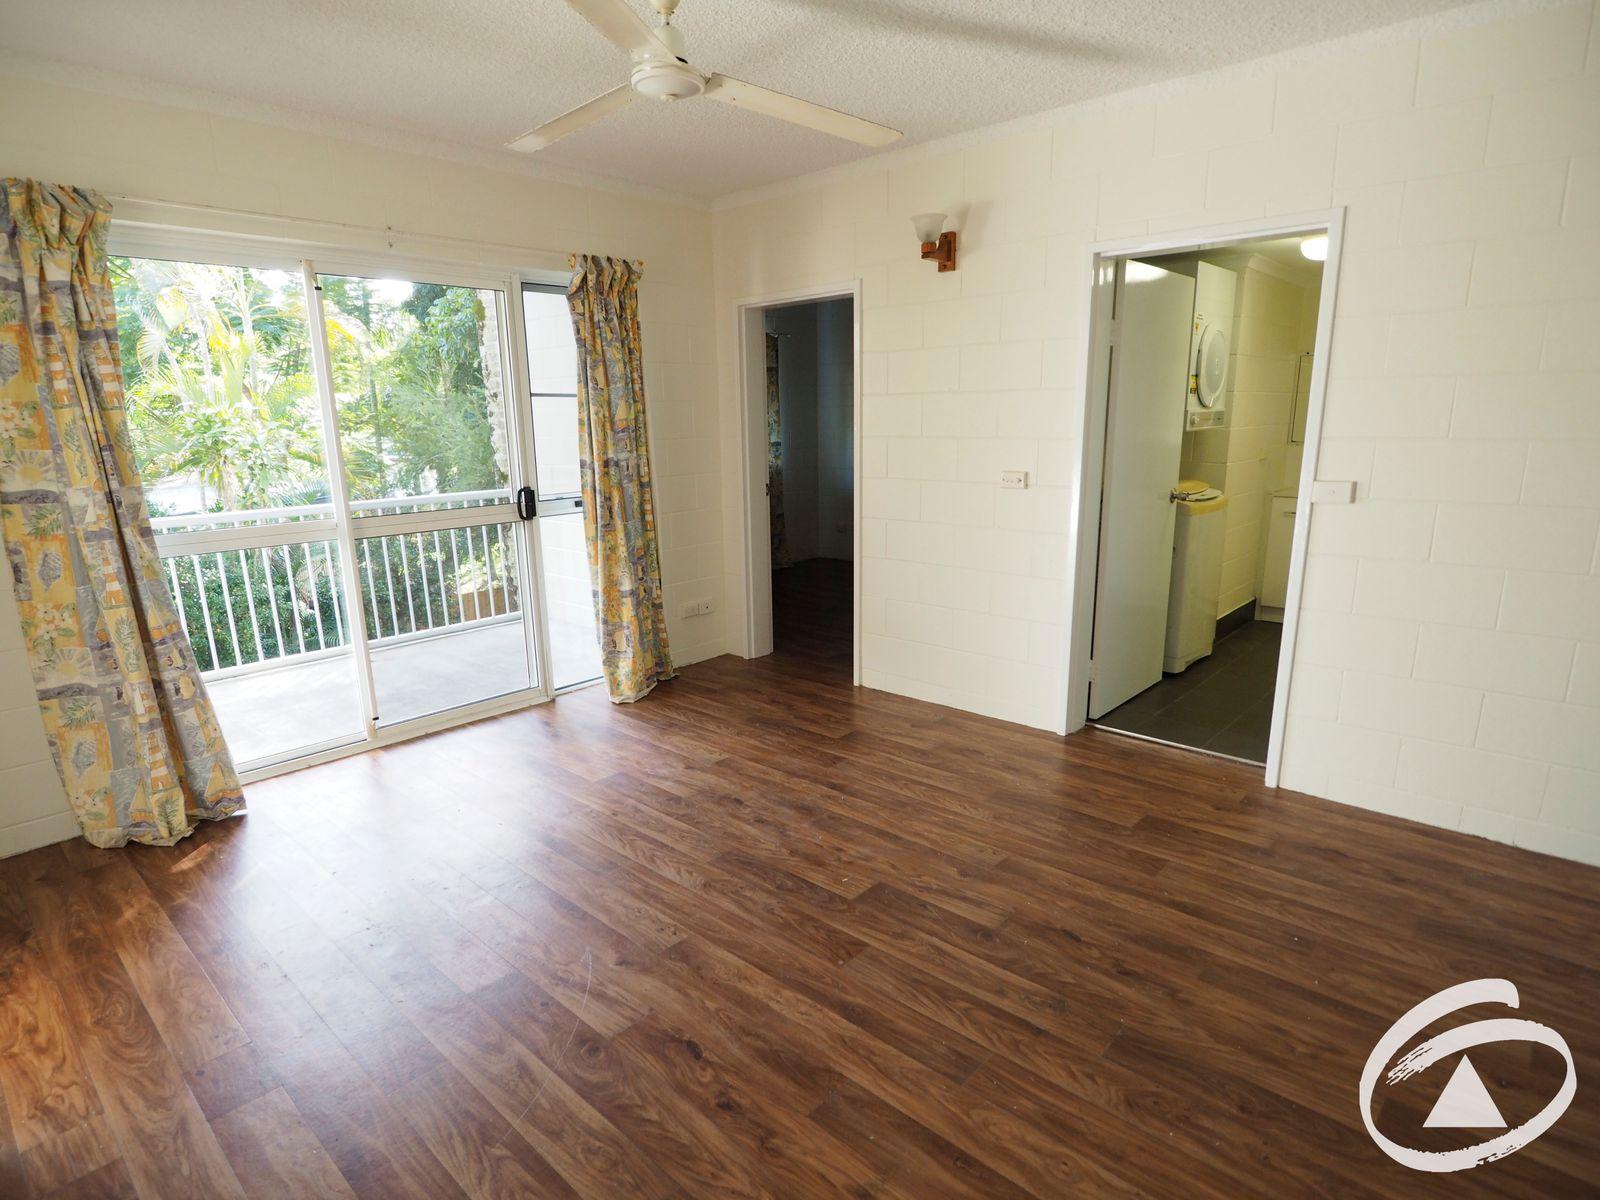 8/538 Varley Street, Yorkeys Knob, QLD 4878